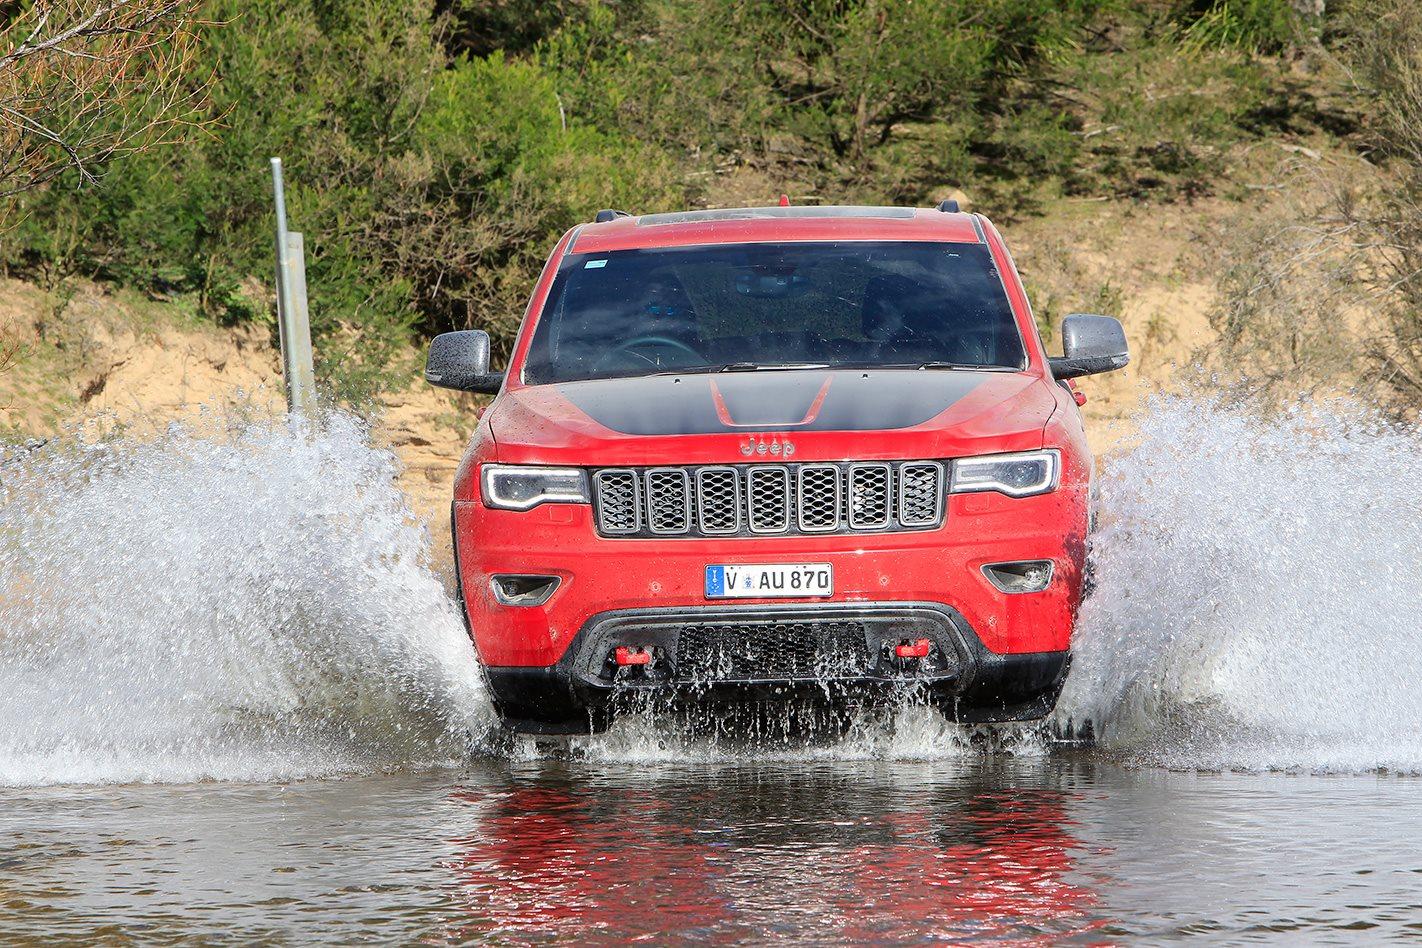 2017 Jeep Grand Cherokee Trailhawk offroad.jpg